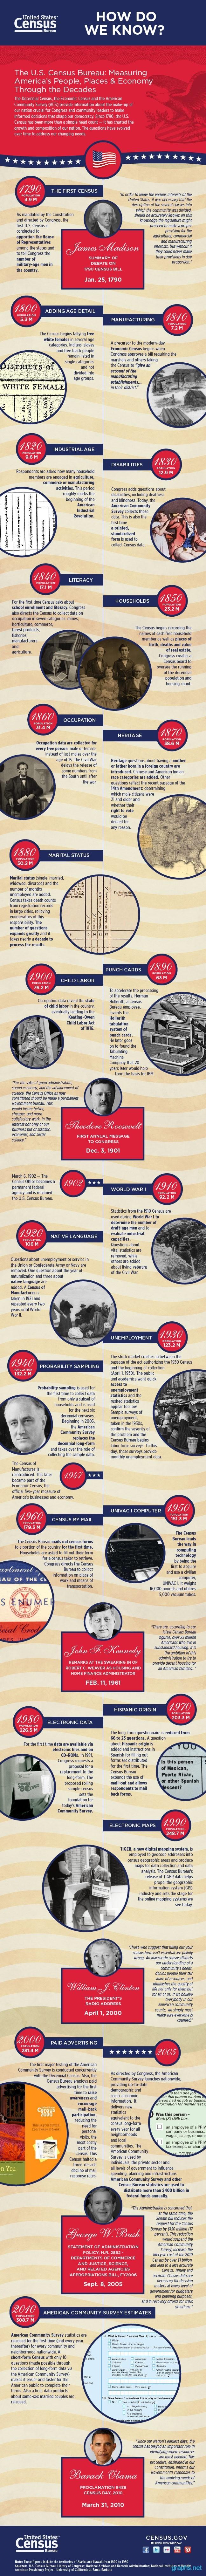 united states census timeline